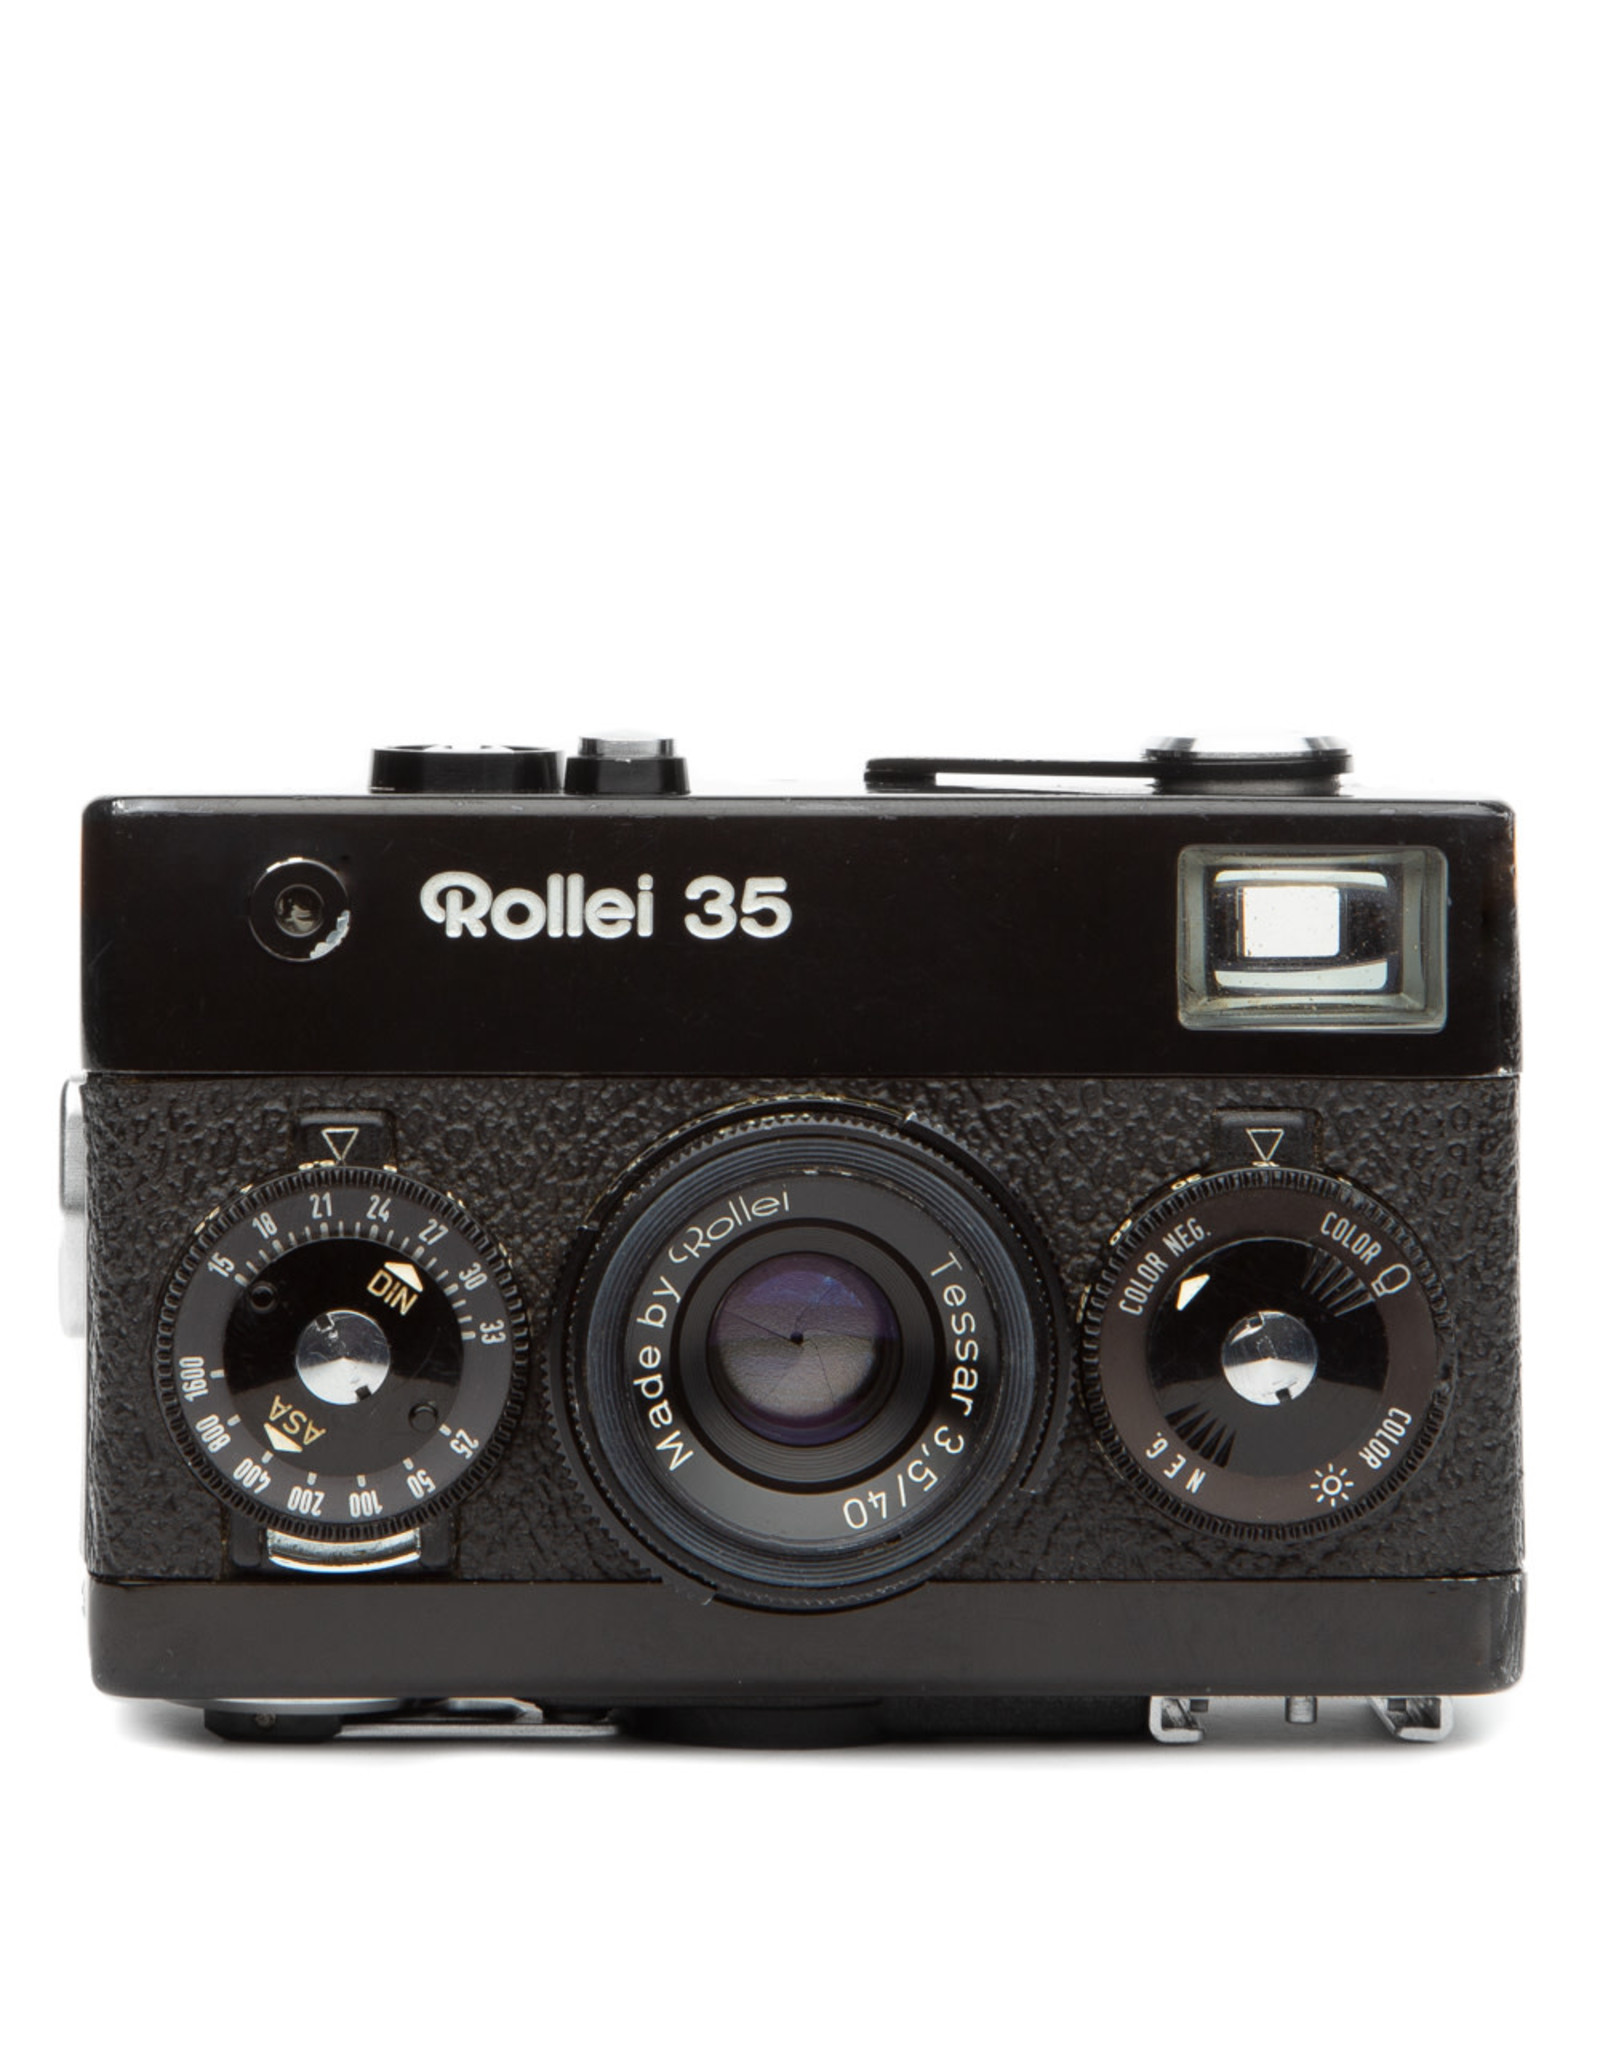 Rollei Rollei 35 Compact 35mm Camera w/Tessar 3.5 40mm Lens & Flash (black)